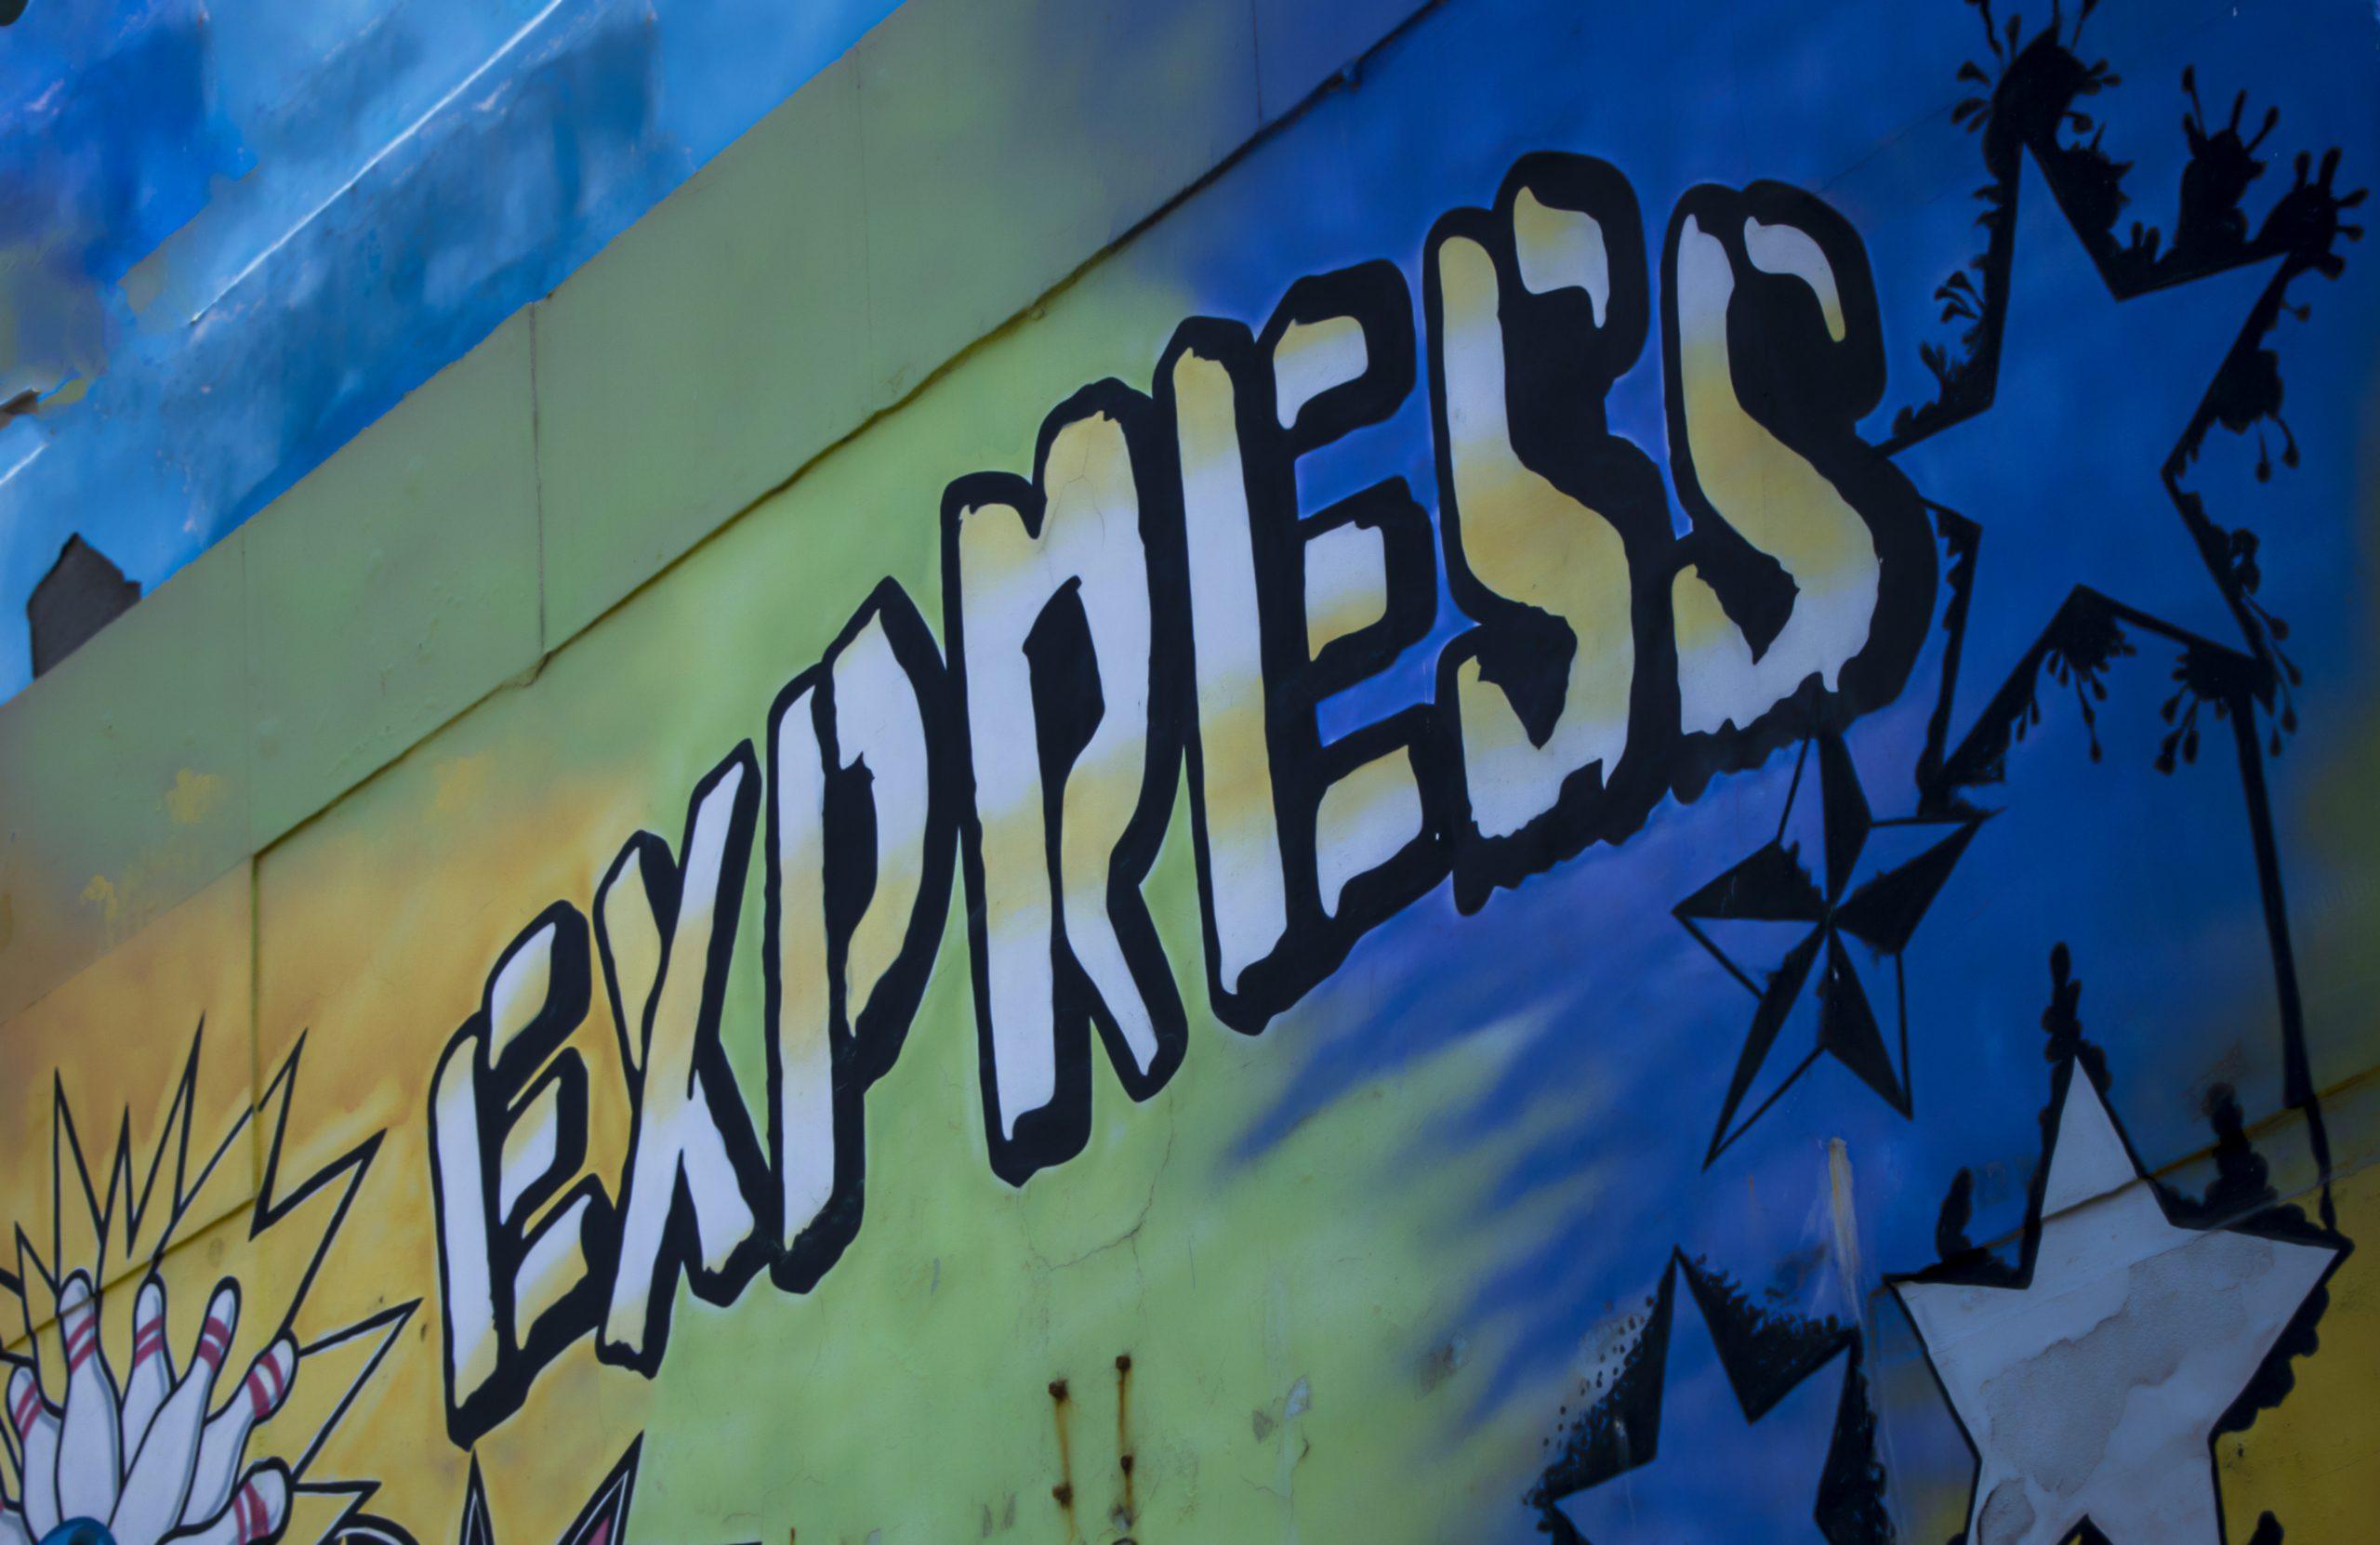 Express written in graffiti